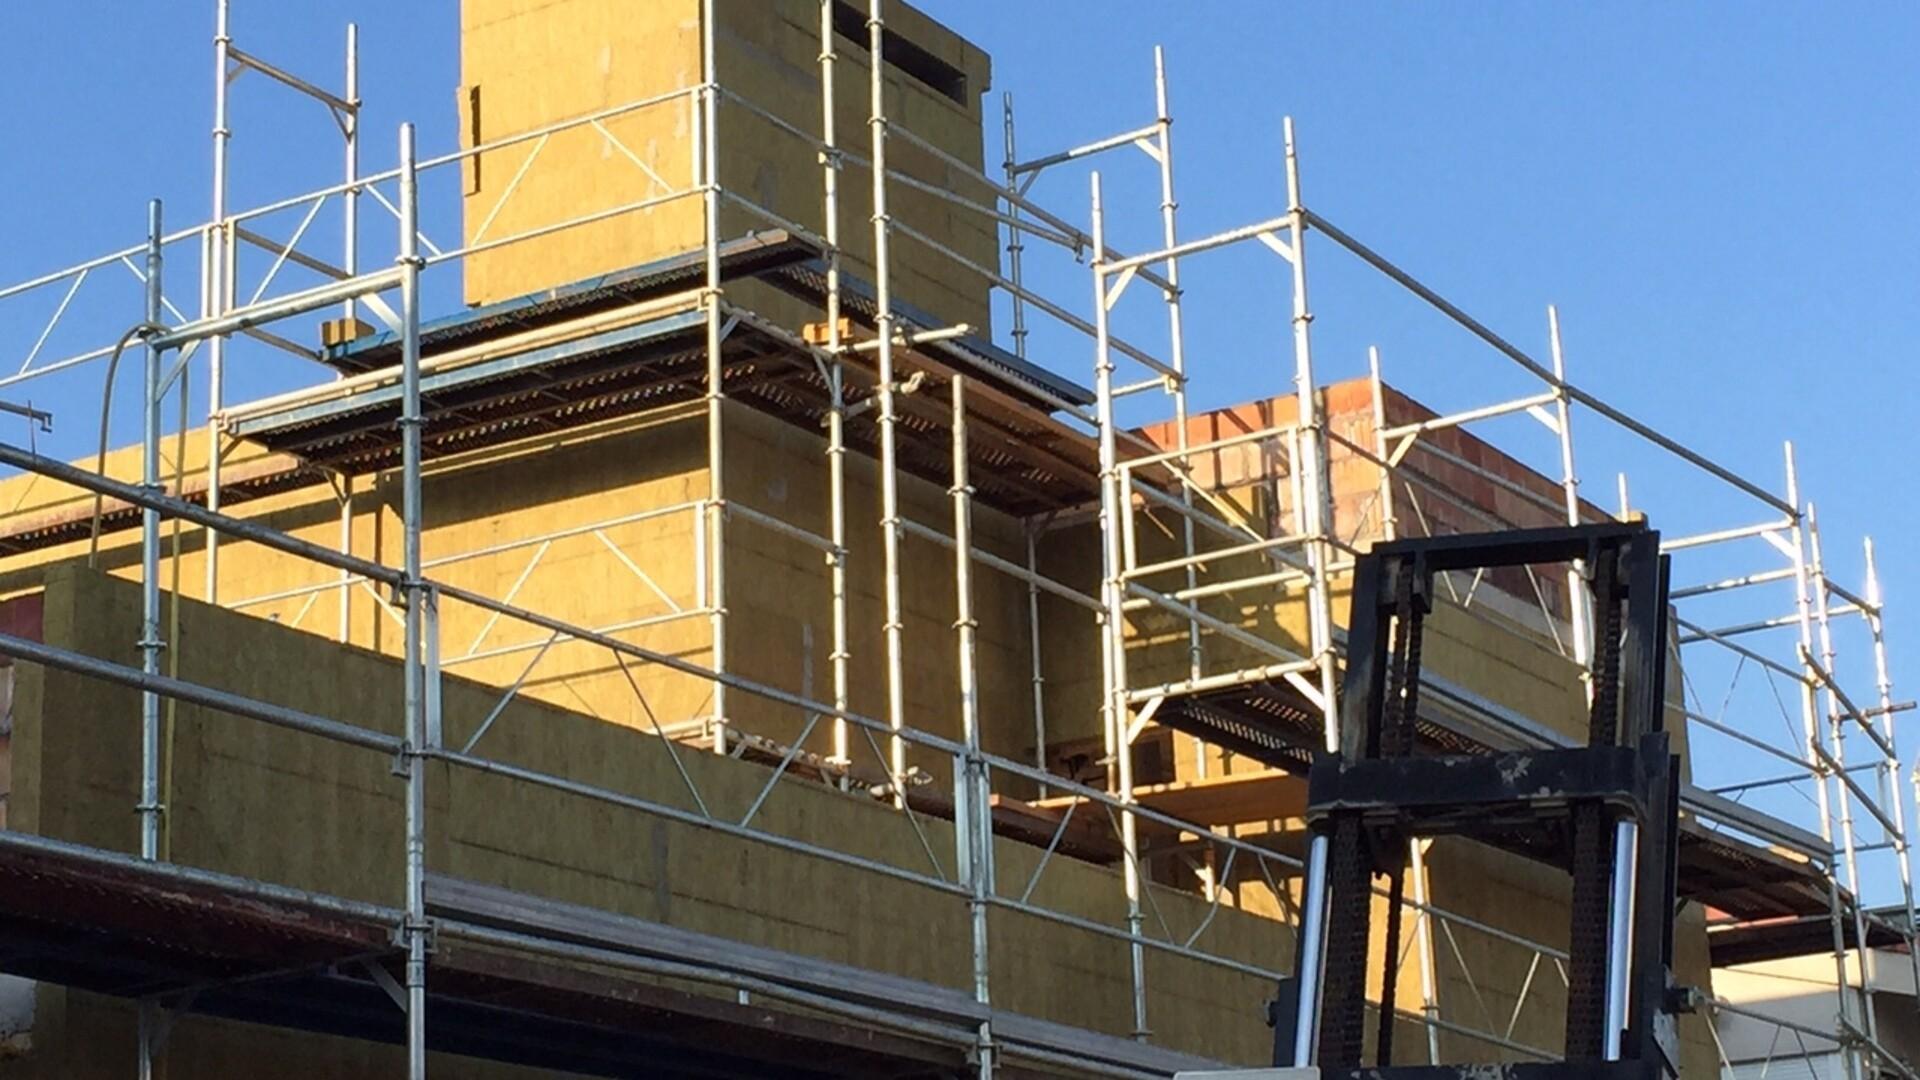 single family house, Passivhaus, EECN, REDArt, ETICS, nearly zero energy building